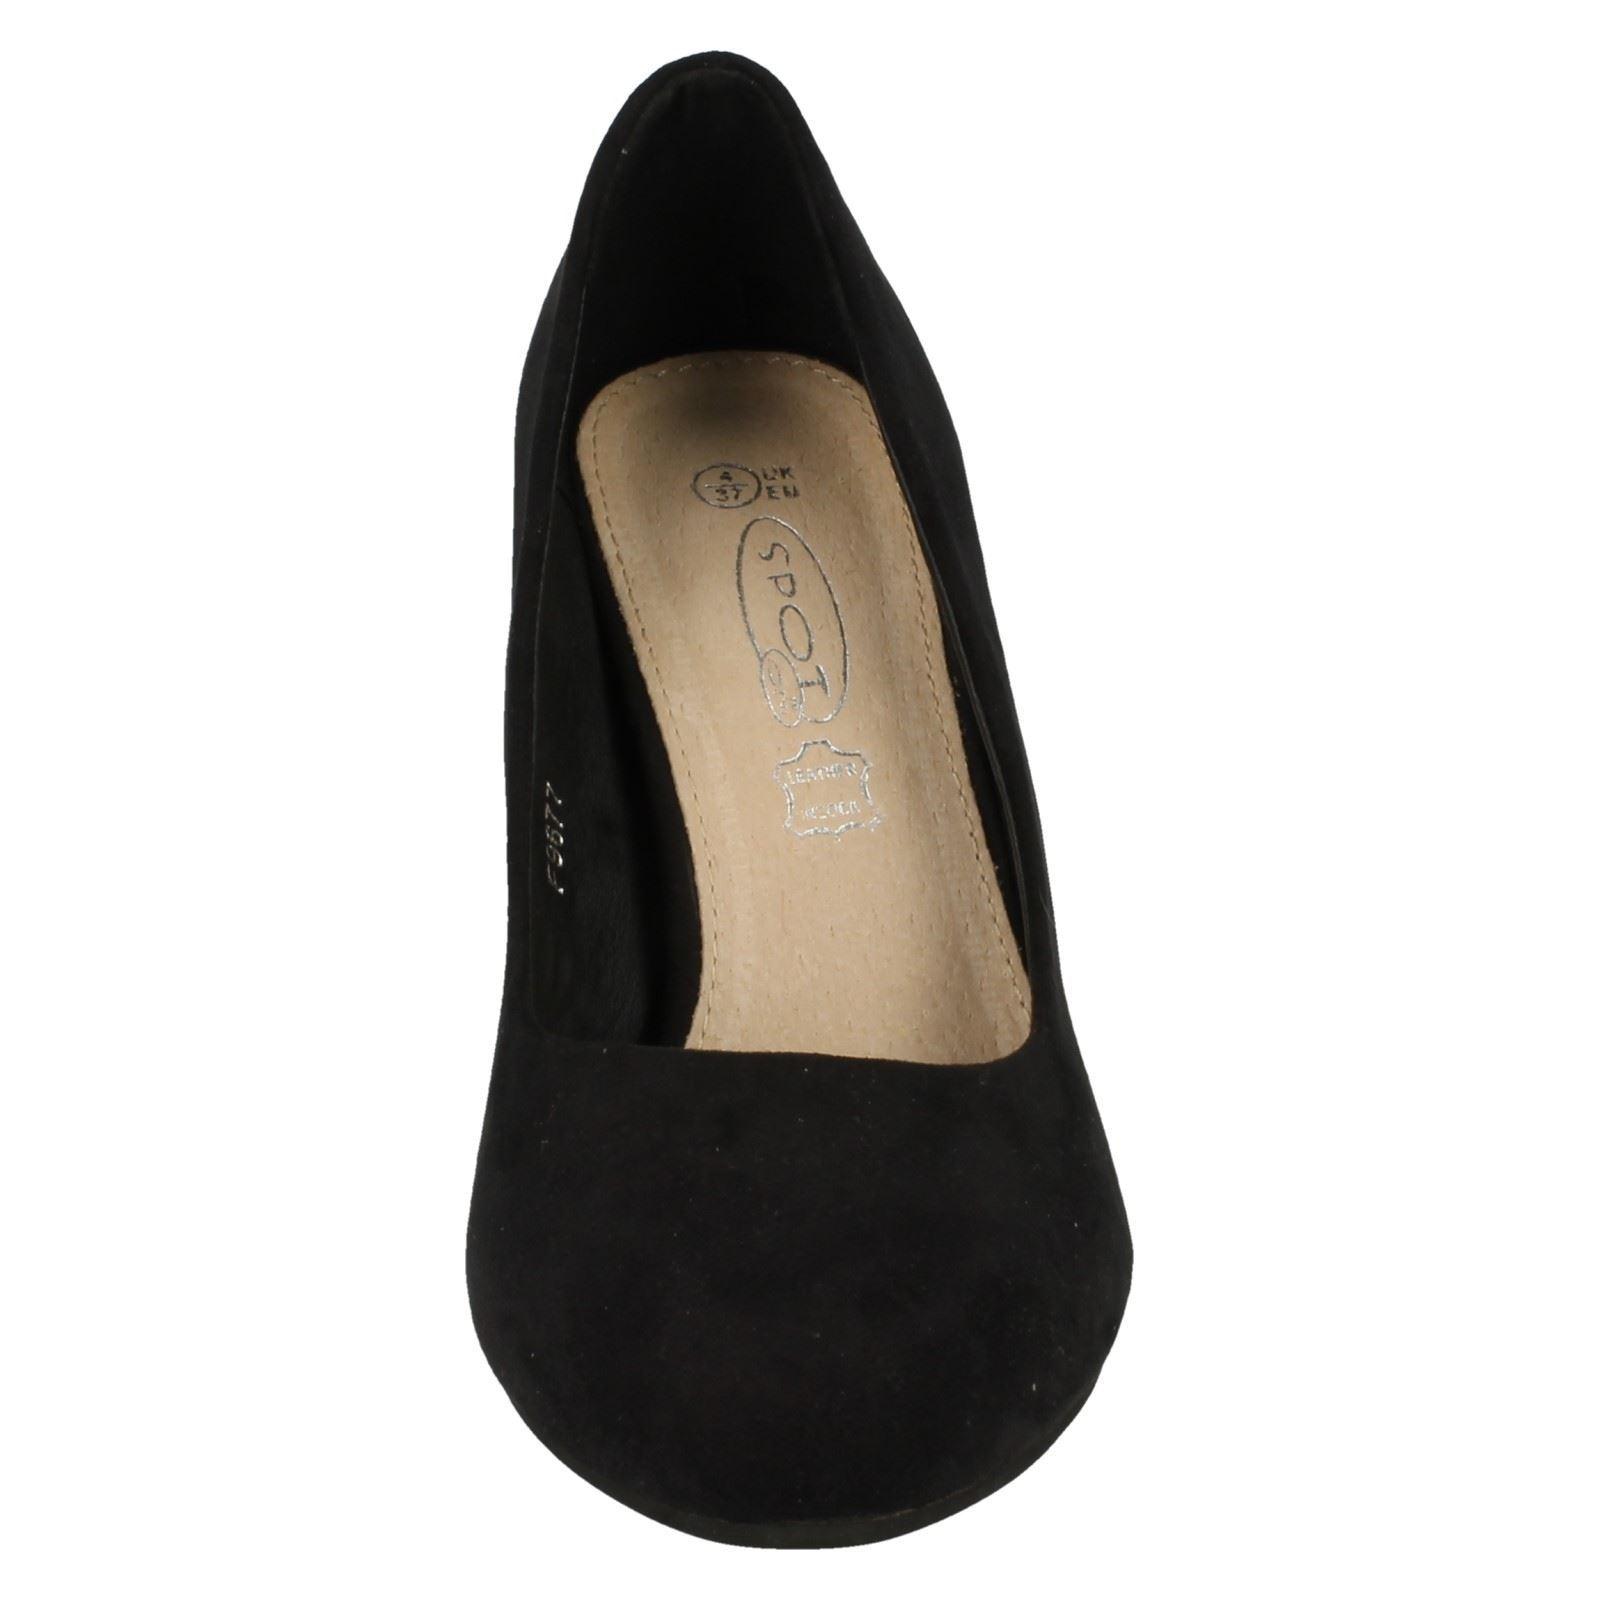 Mujer Spot On microfibra Zapatos De Salón Estilo - f9677-D